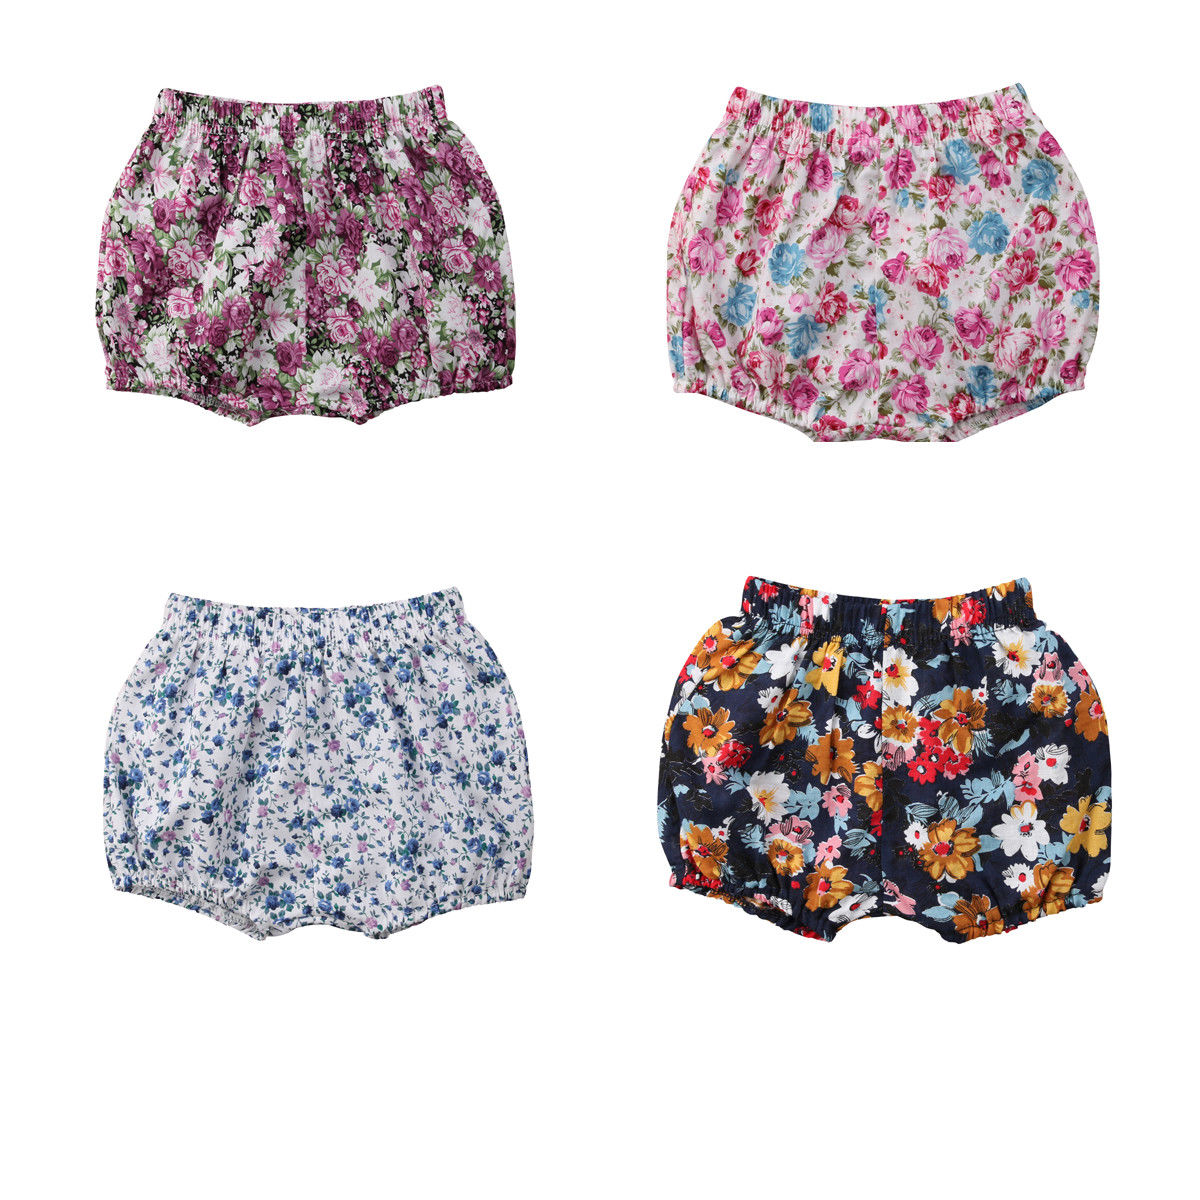 Cute Baby Girls   Shorts   Summer Infant Toddler Little Girls Cotton Blend Newborn Bloomers Toddler Flower   Shorts